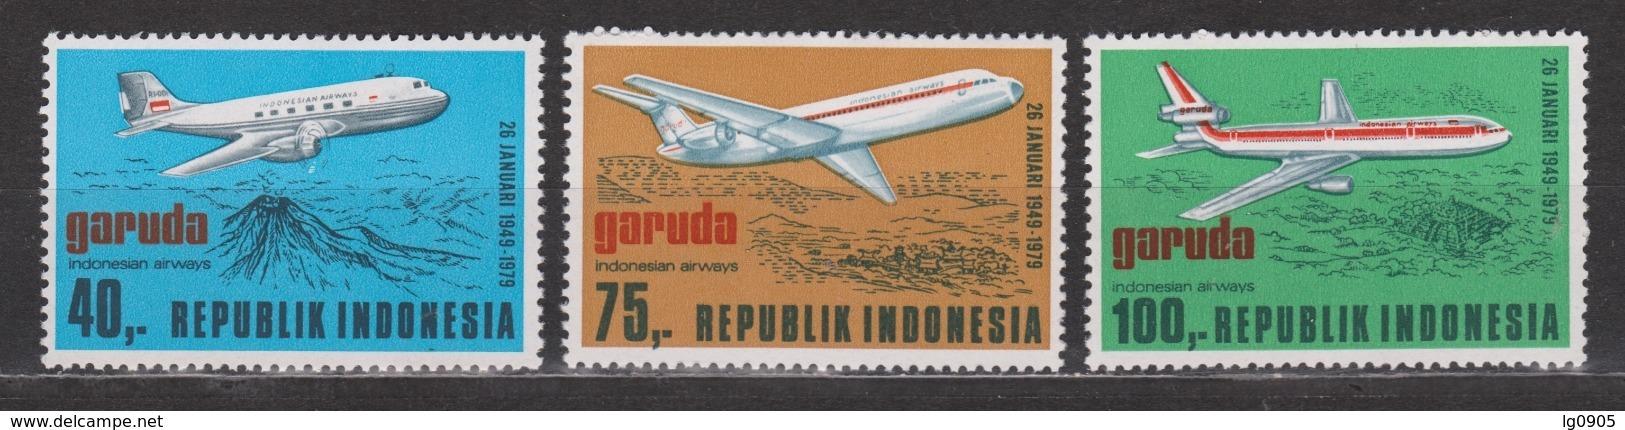 Indonesie 942-944 MNH ; Vliegtuig, Flugzeuge, Avion, Avion, Aeroplane 1979 NOW MANY STAMPS INDONESIA VERY CHEAP - Vliegtuigen